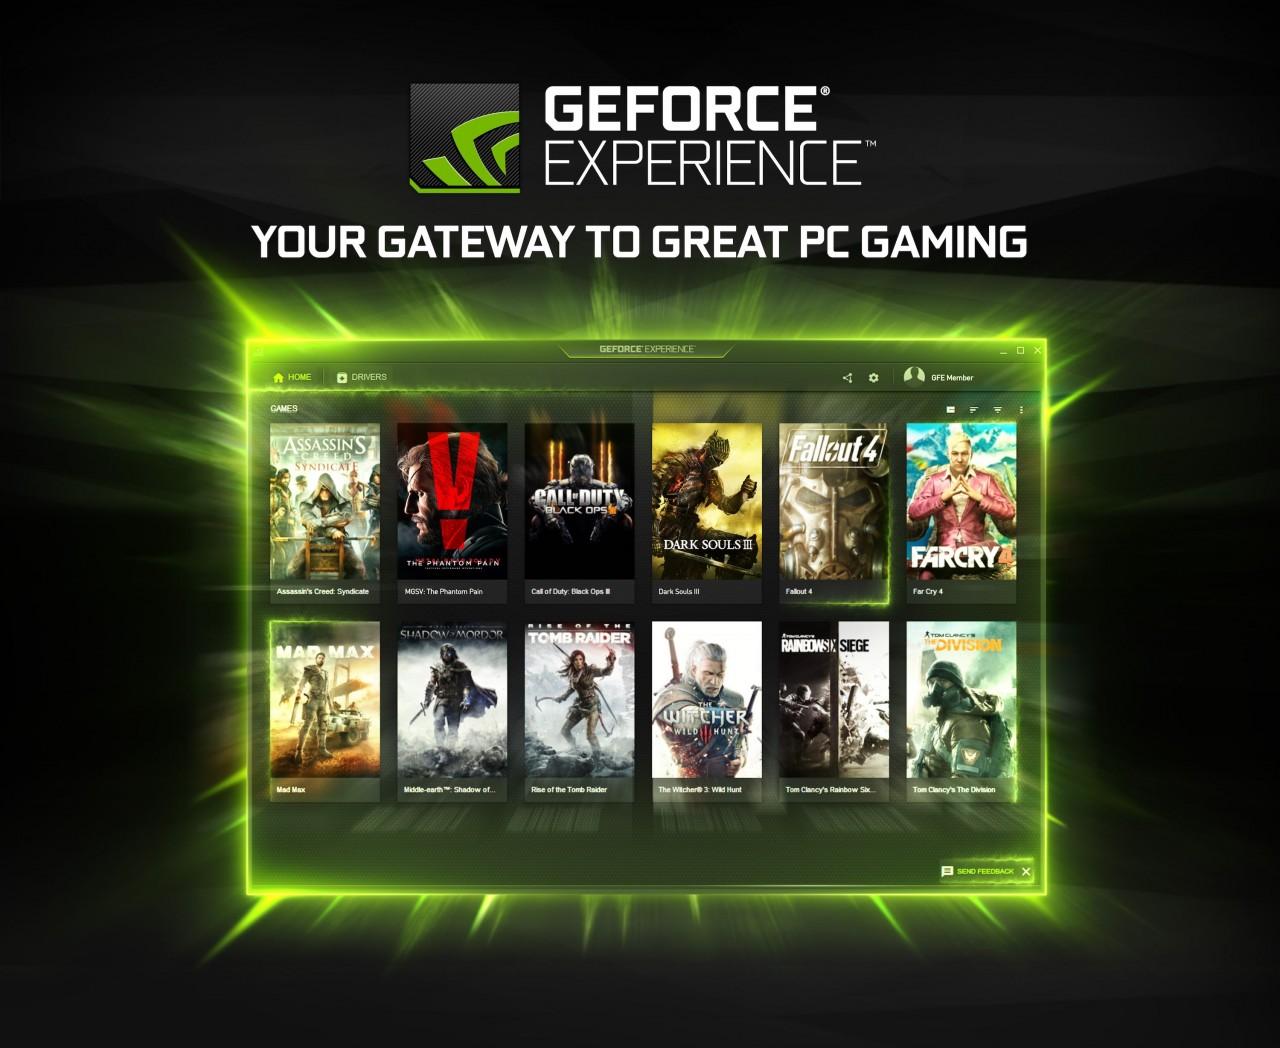 NVIDIA GeForce Experience 3